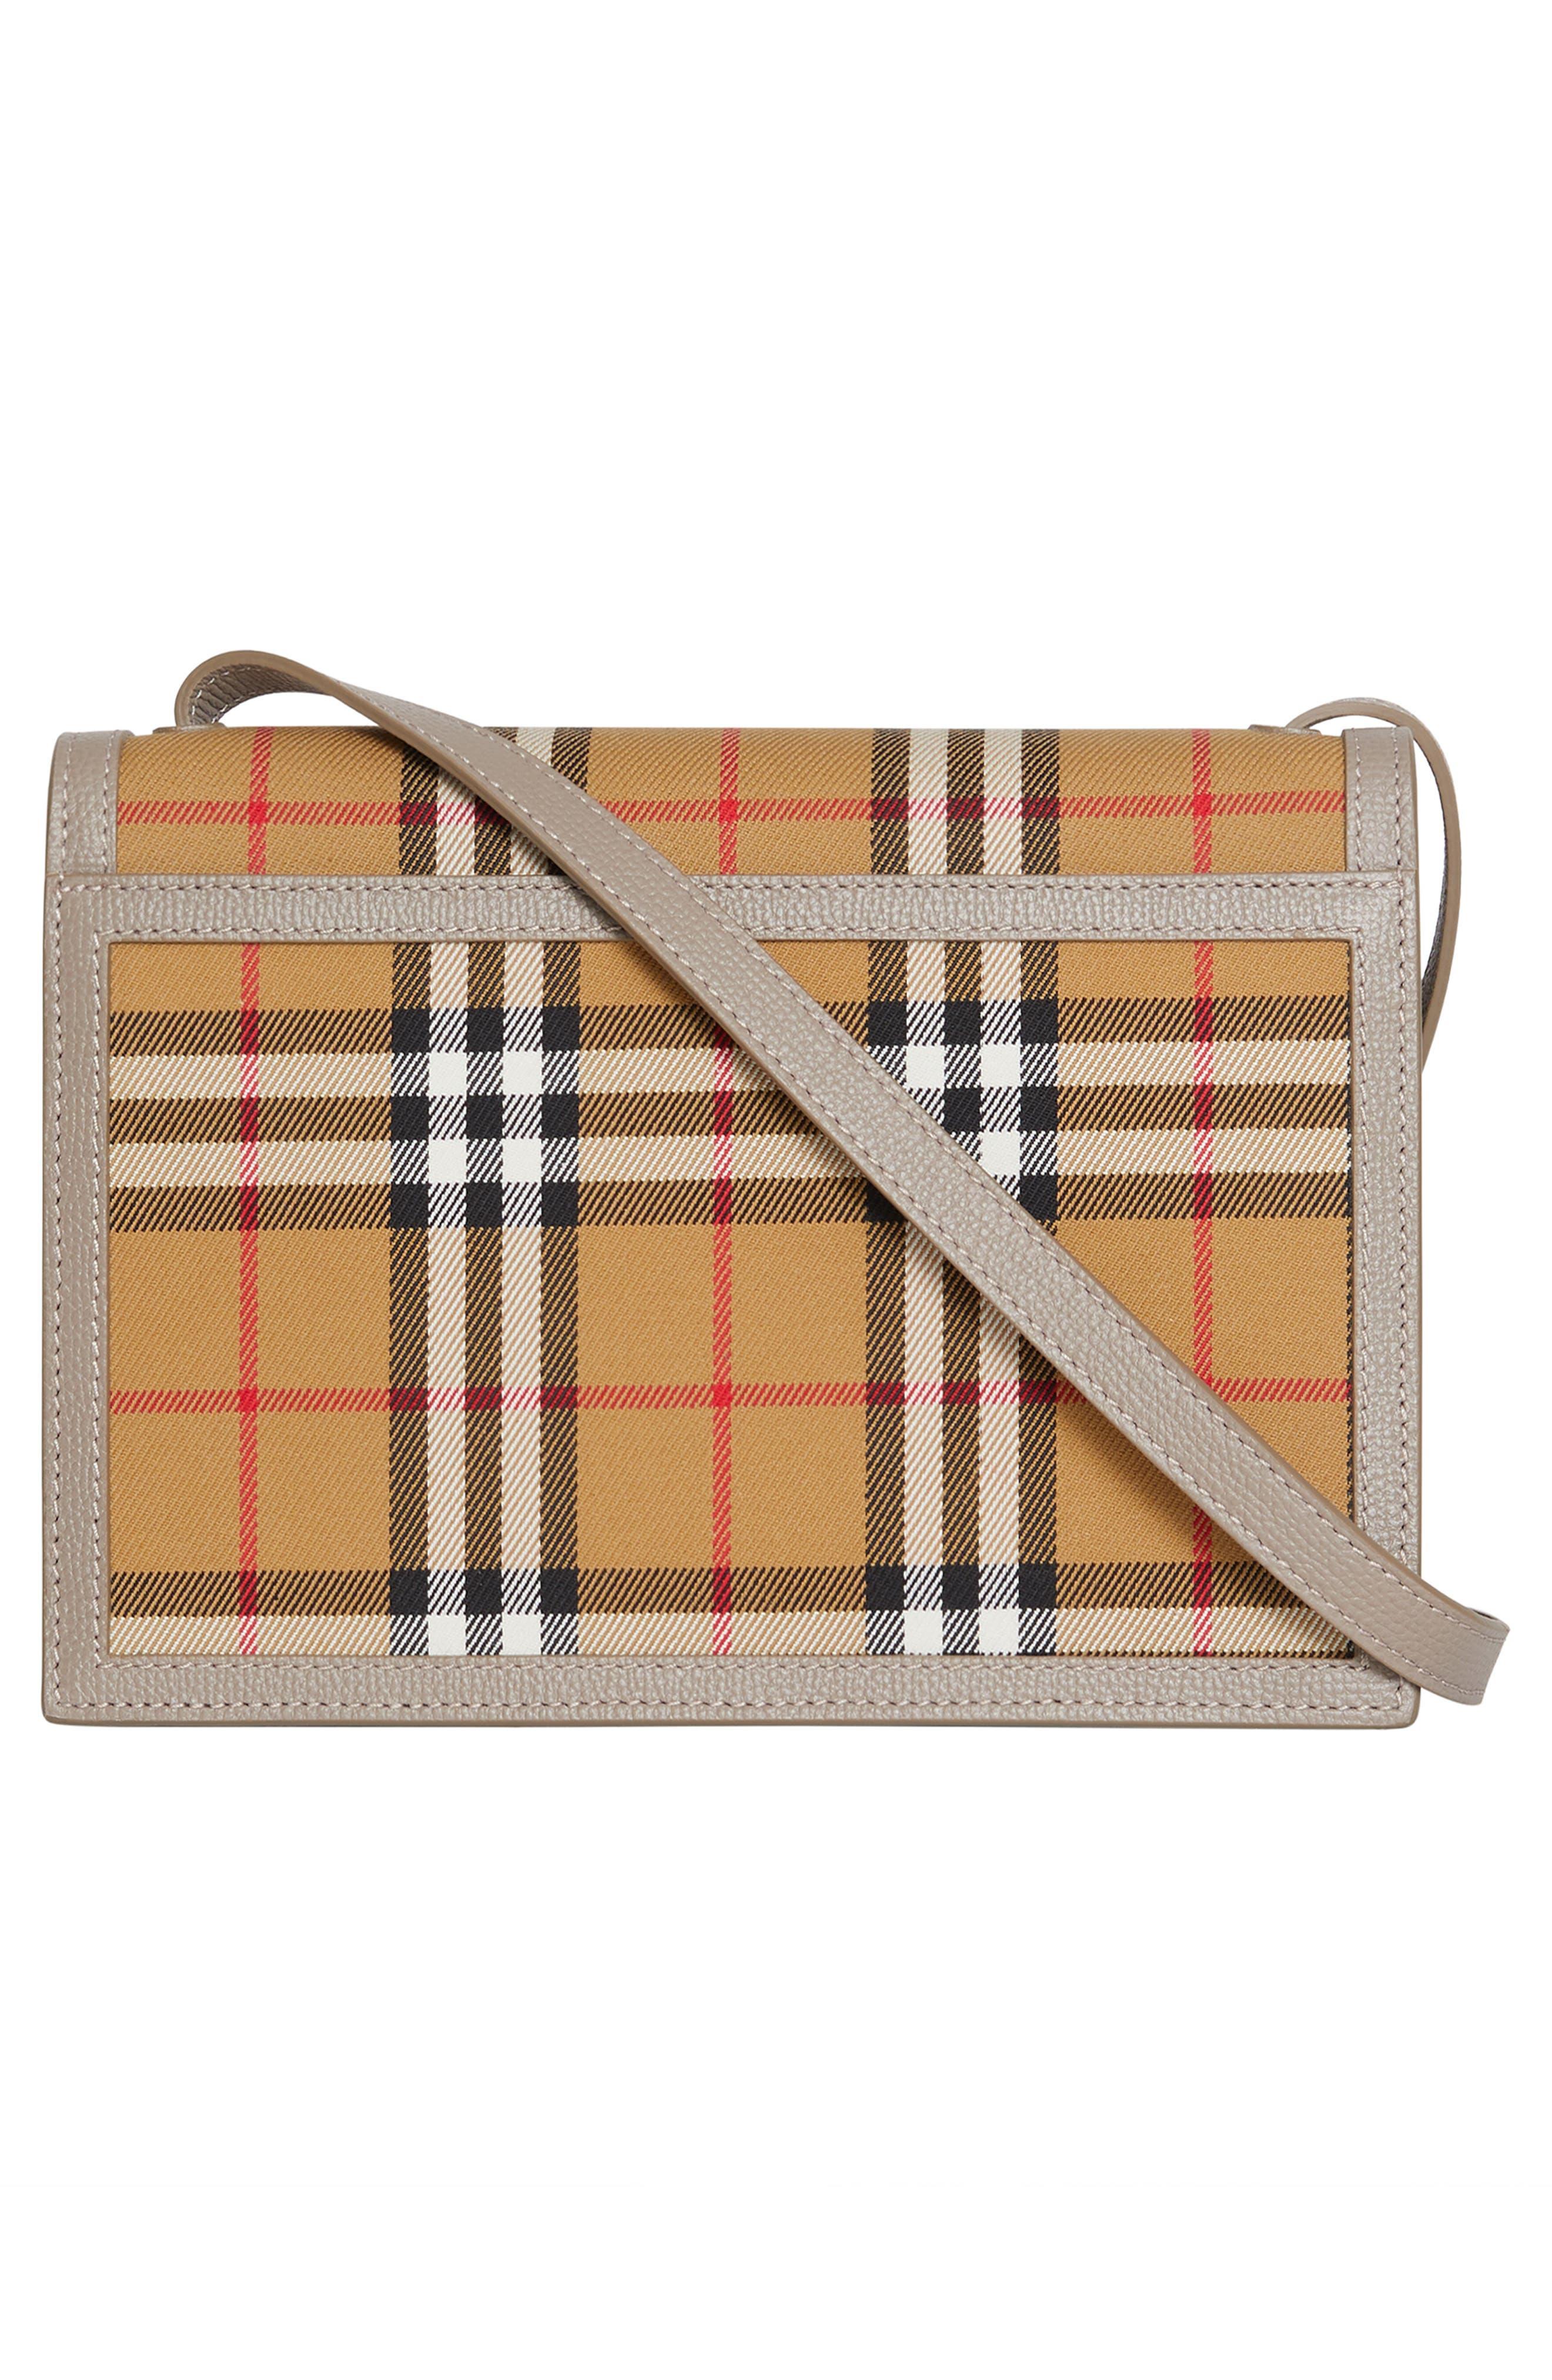 Small Macken Vintage Check Crossbody Bag,                             Alternate thumbnail 3, color,                             TAUPE BROWN